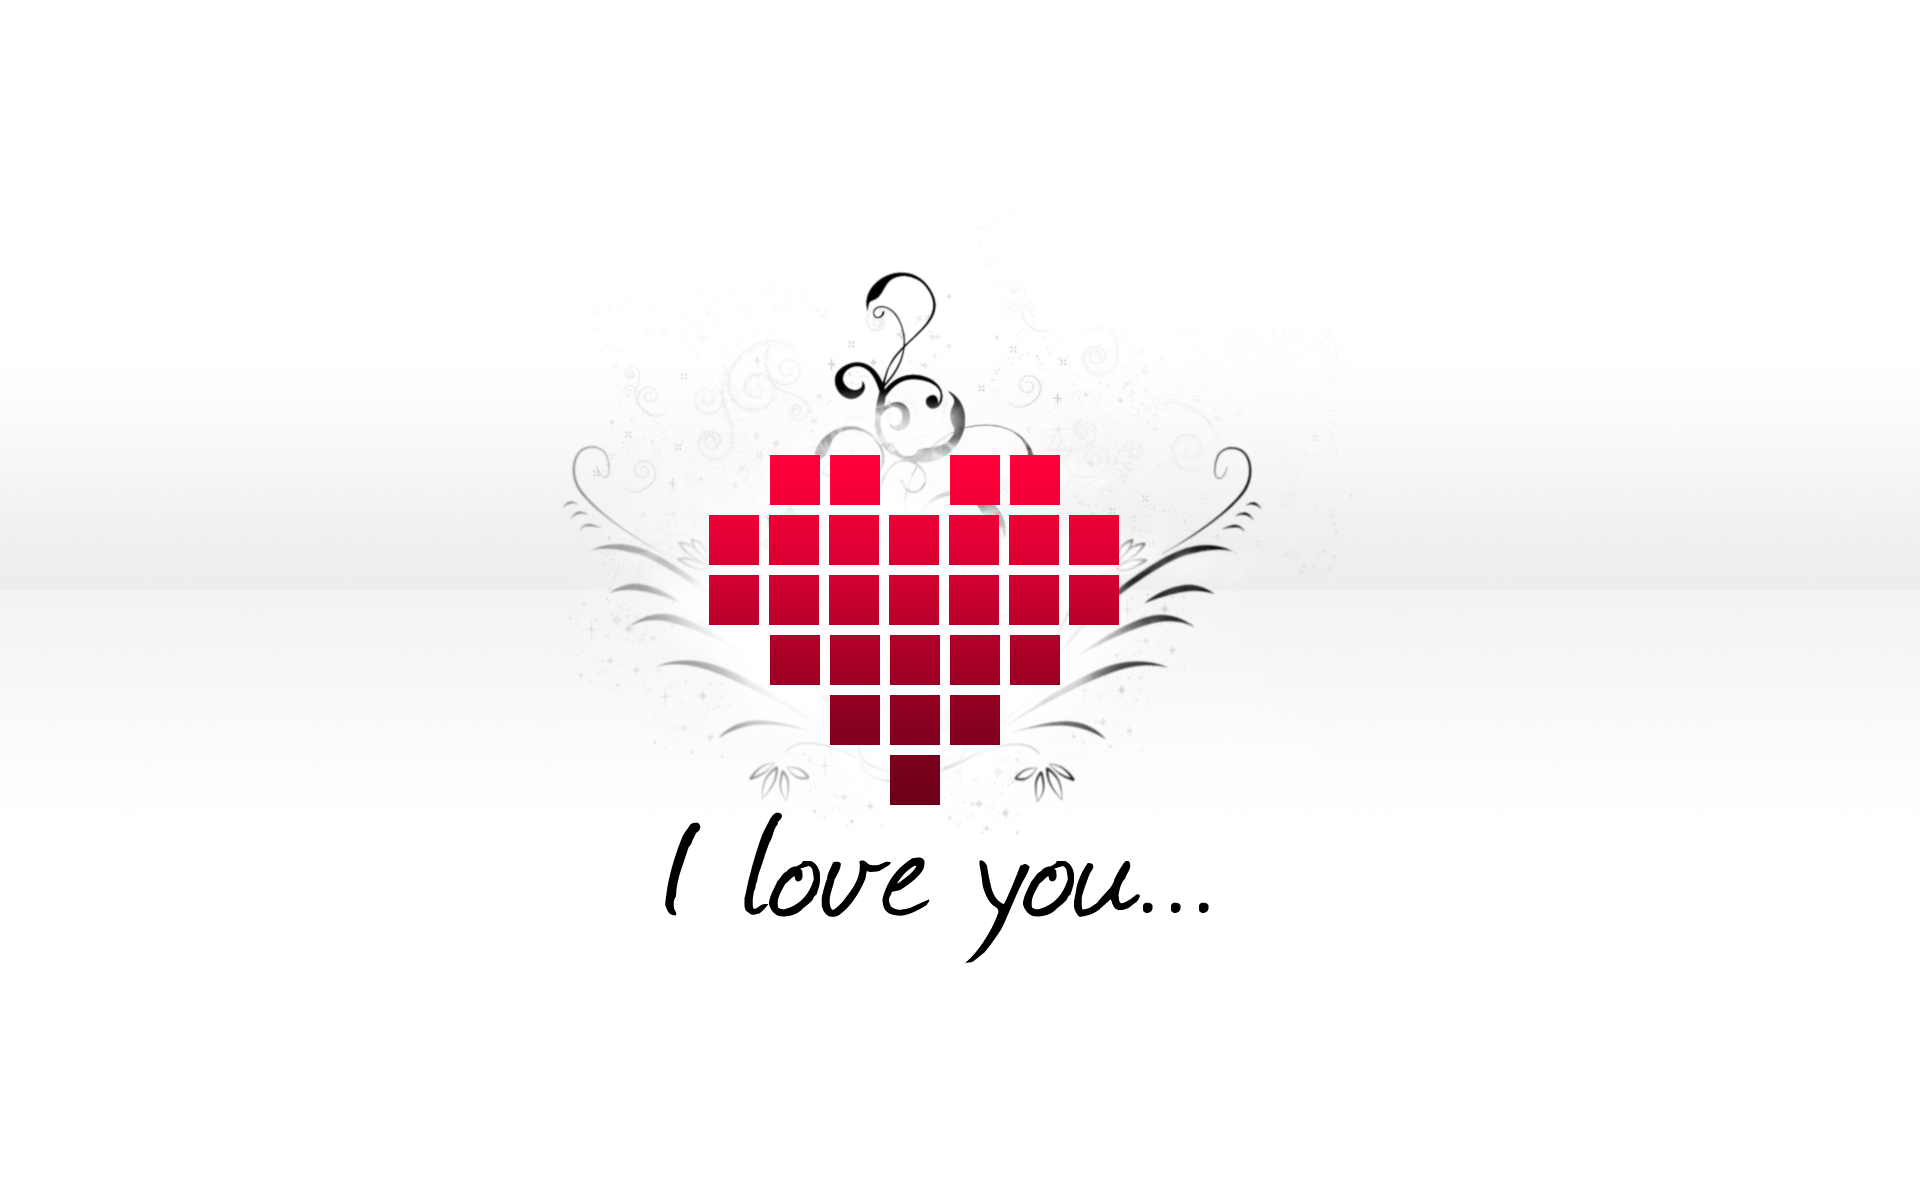 Pixel Hearth 'I love you...'